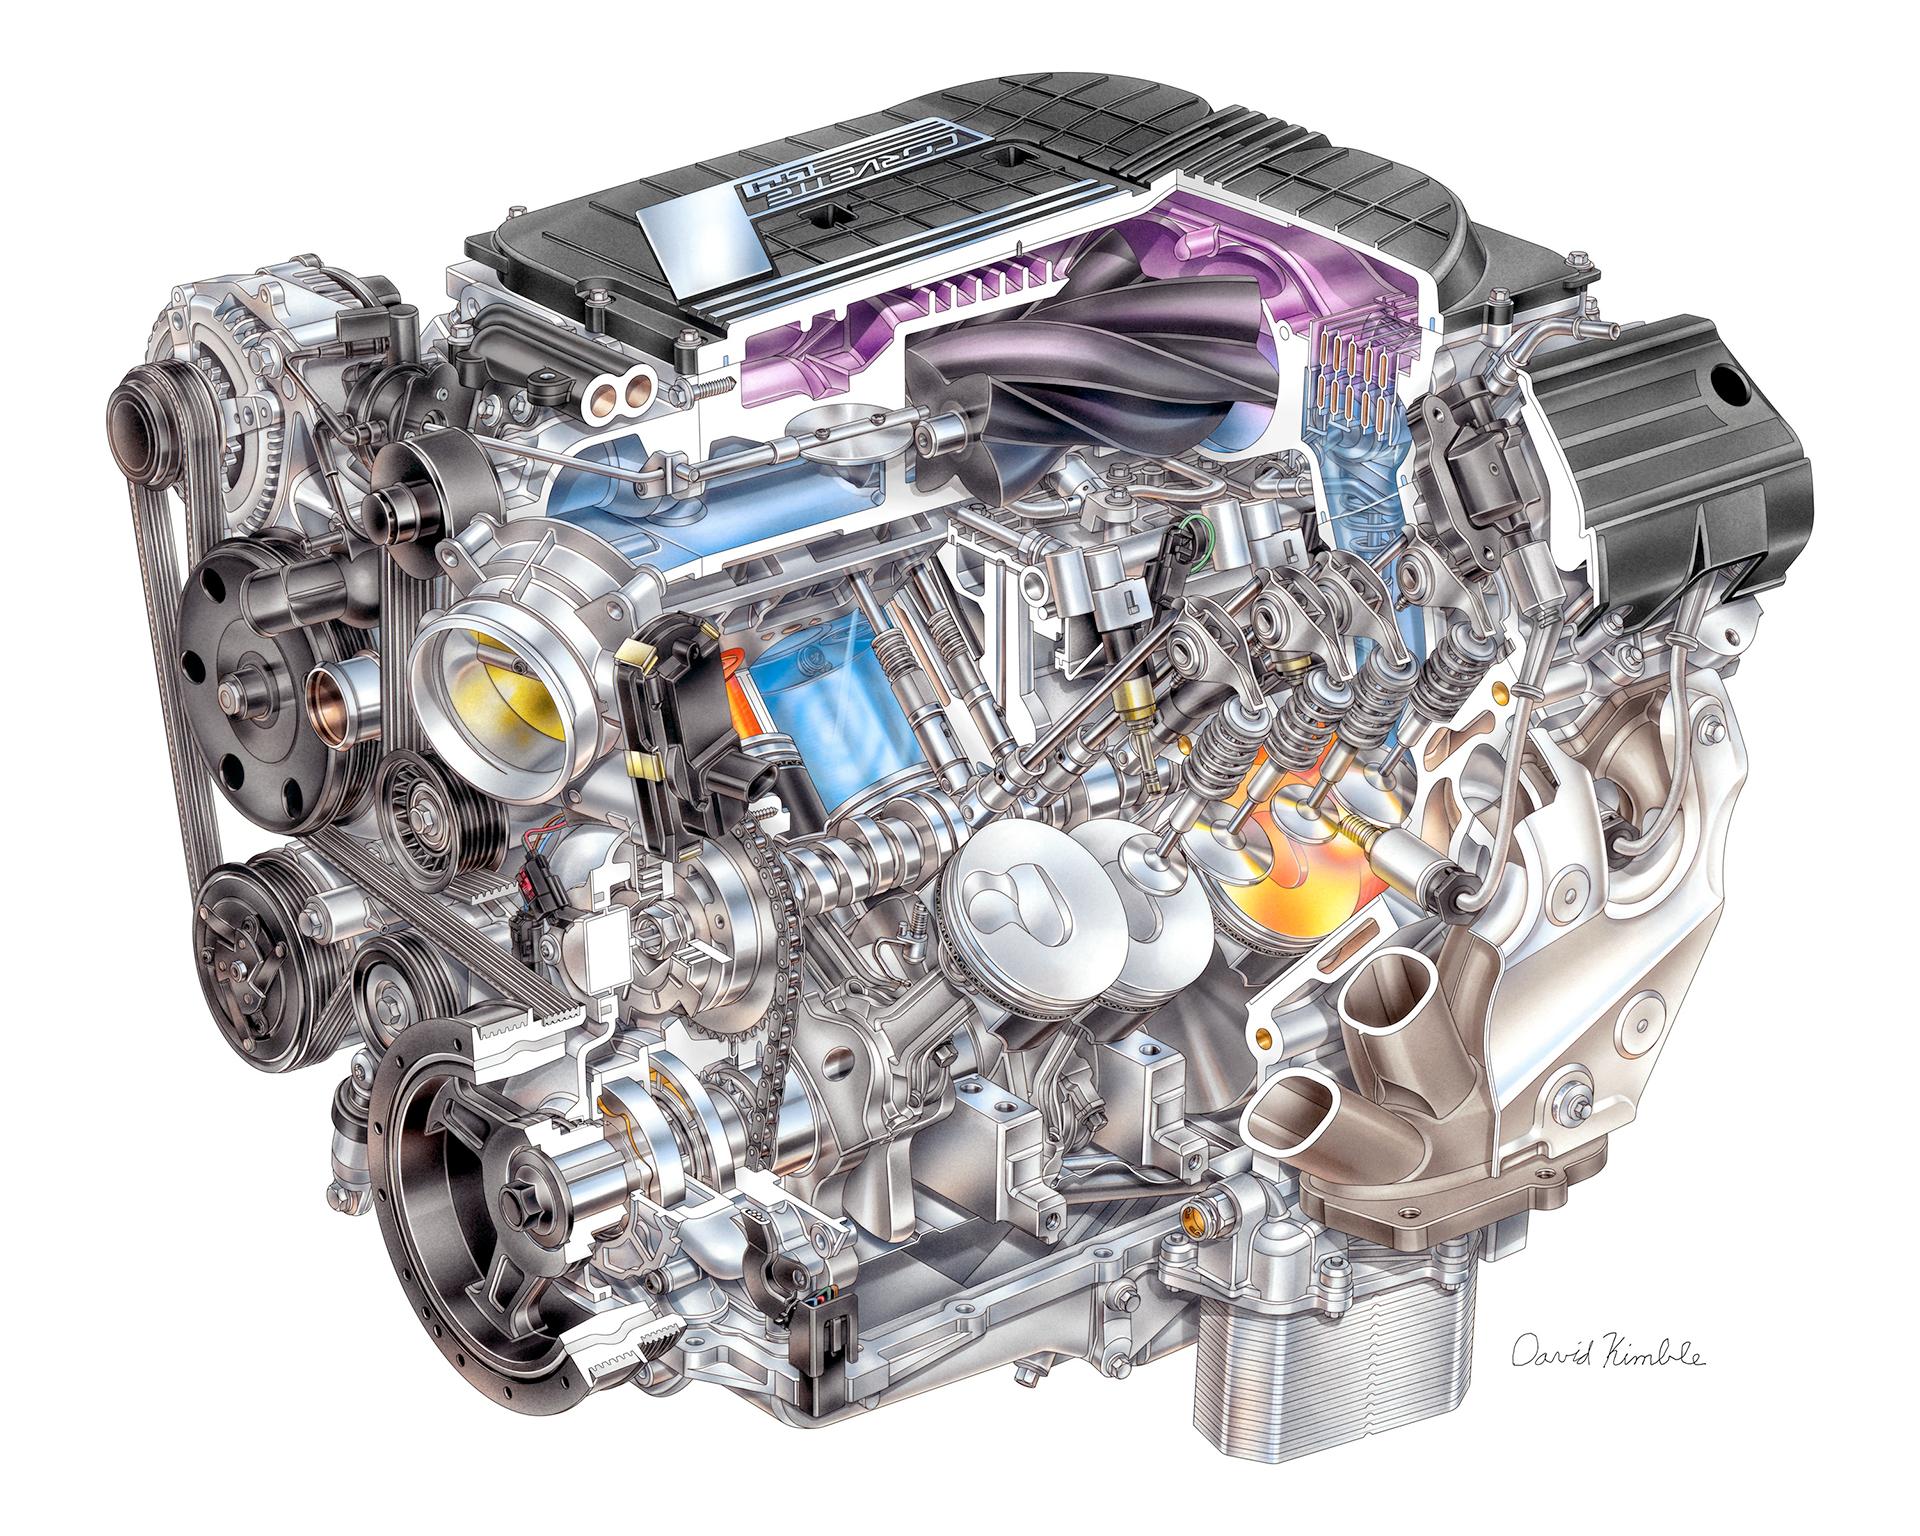 Chevrolet Corvette Z06 - LT4 supercharged 6.2L V-8 - General Motors